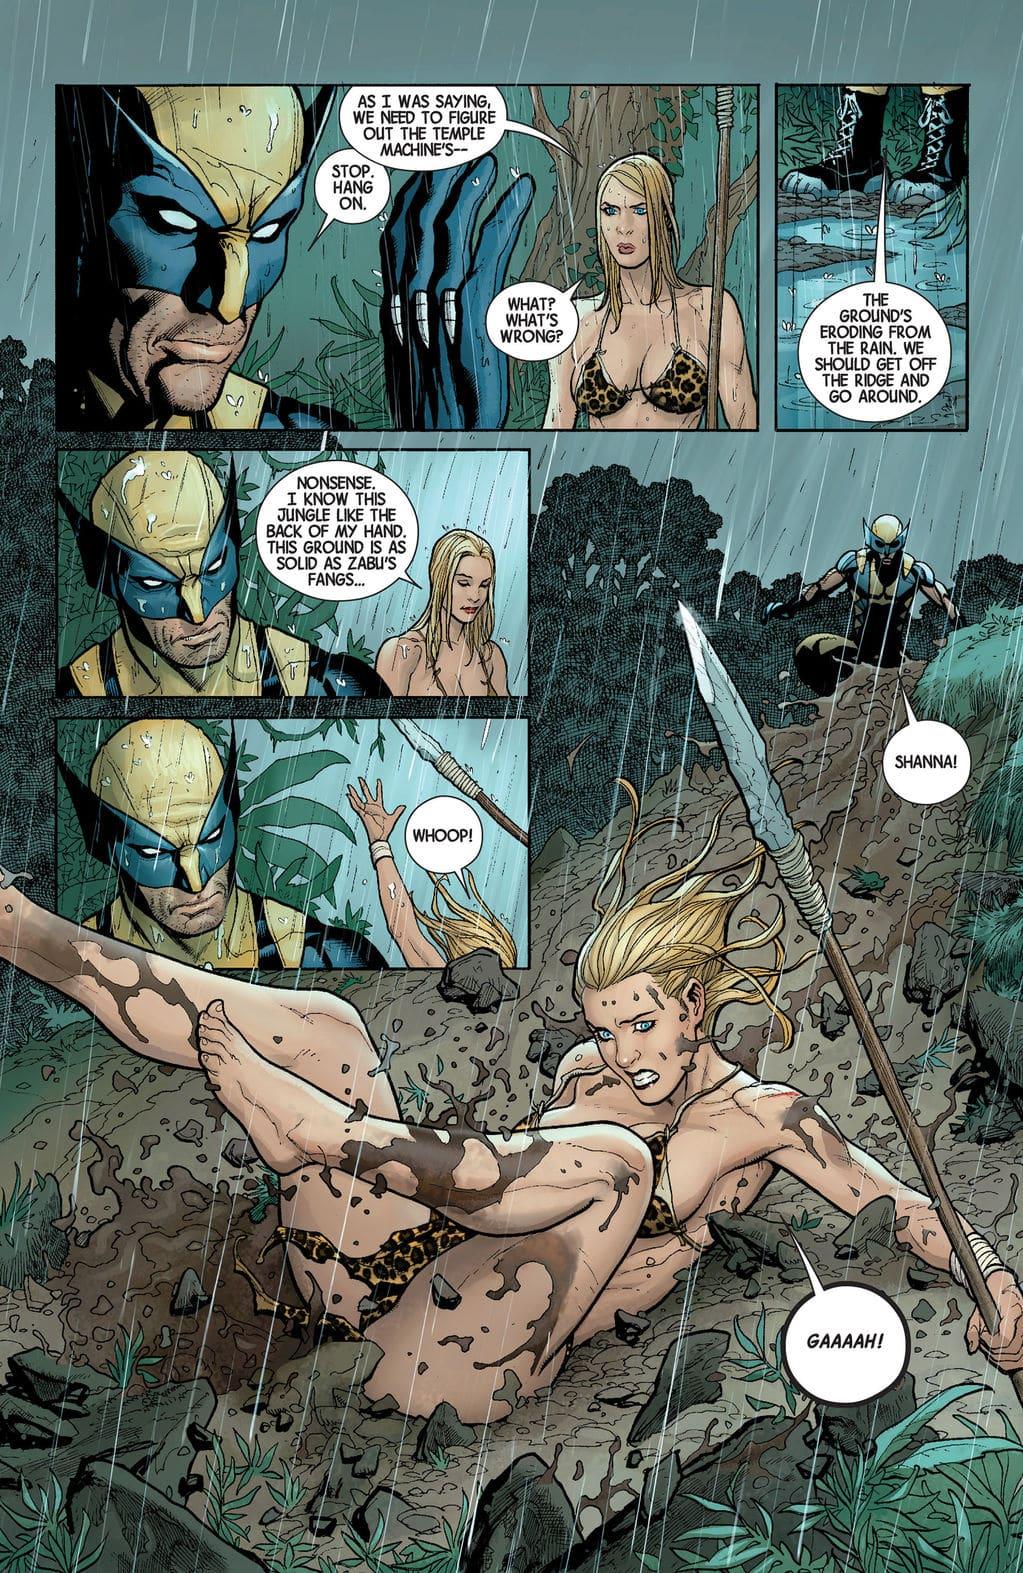 [Gentle Giant] Marvel Comics: Shanna 1/4 012